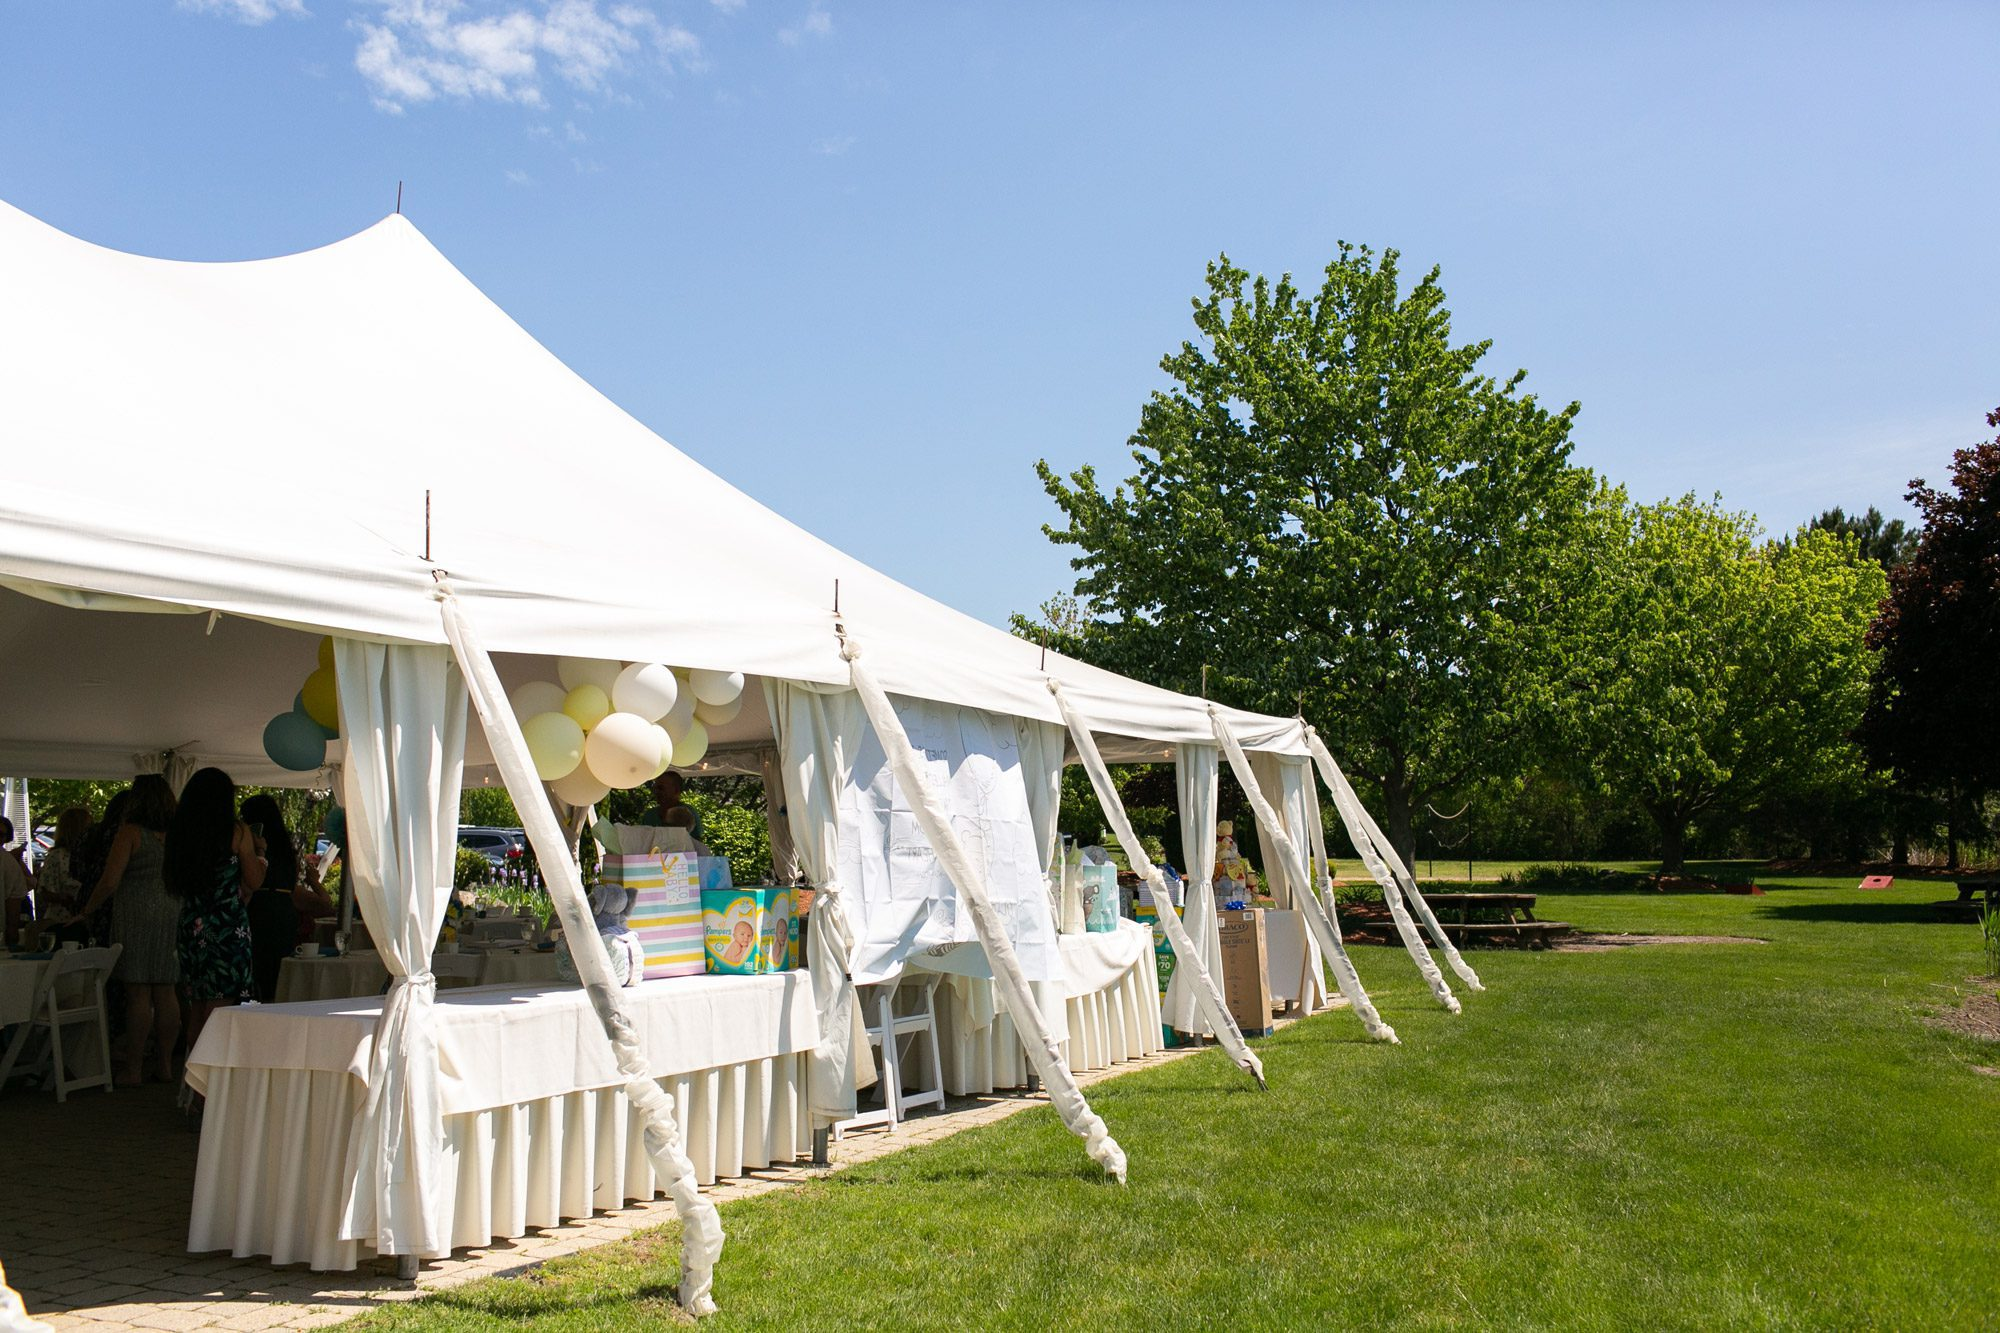 The Tent Pavilion at Danversport